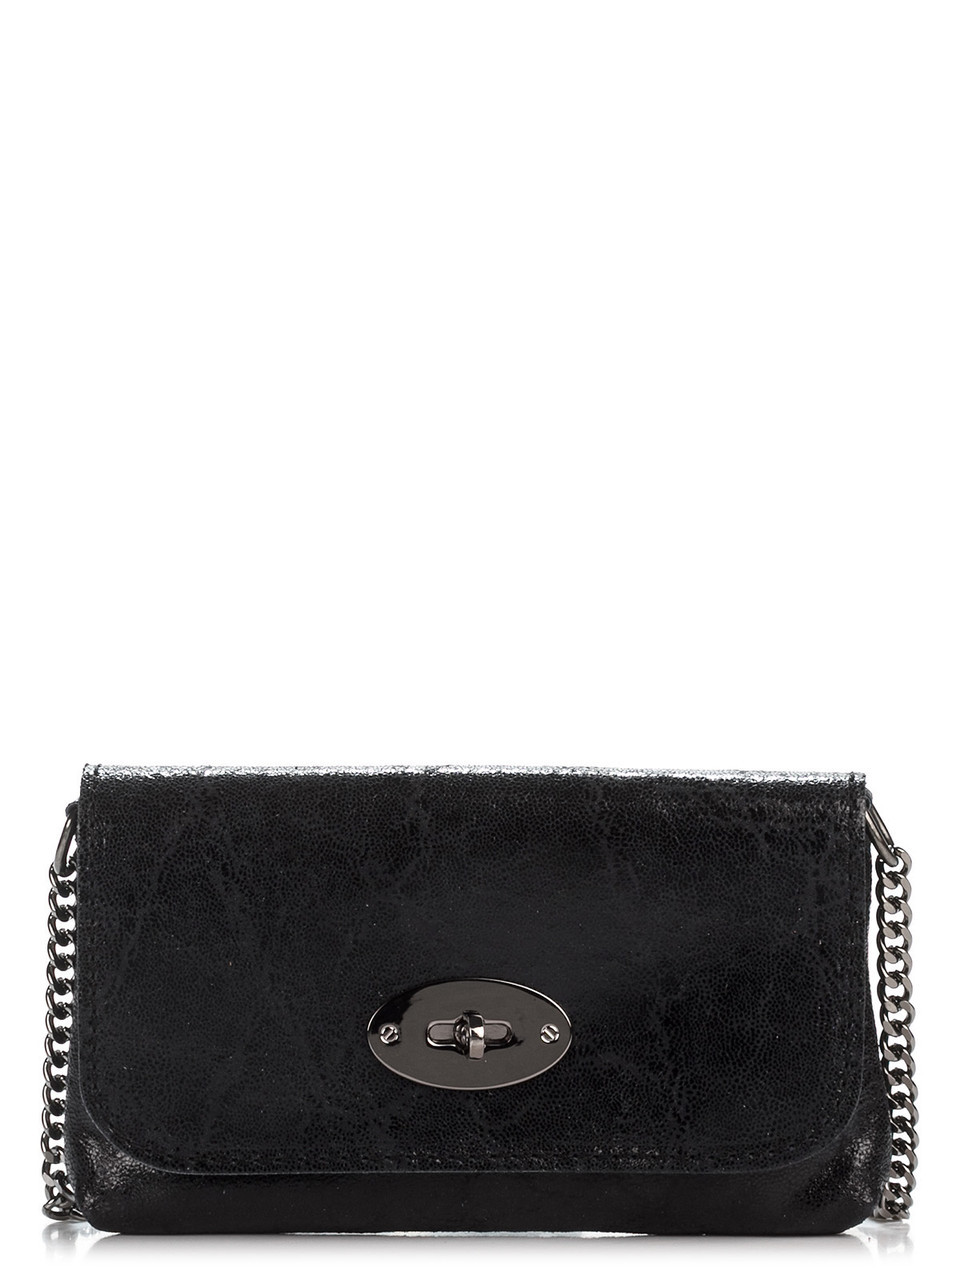 Женская кожаная сумка KITTY Diva's Bag цвет черный